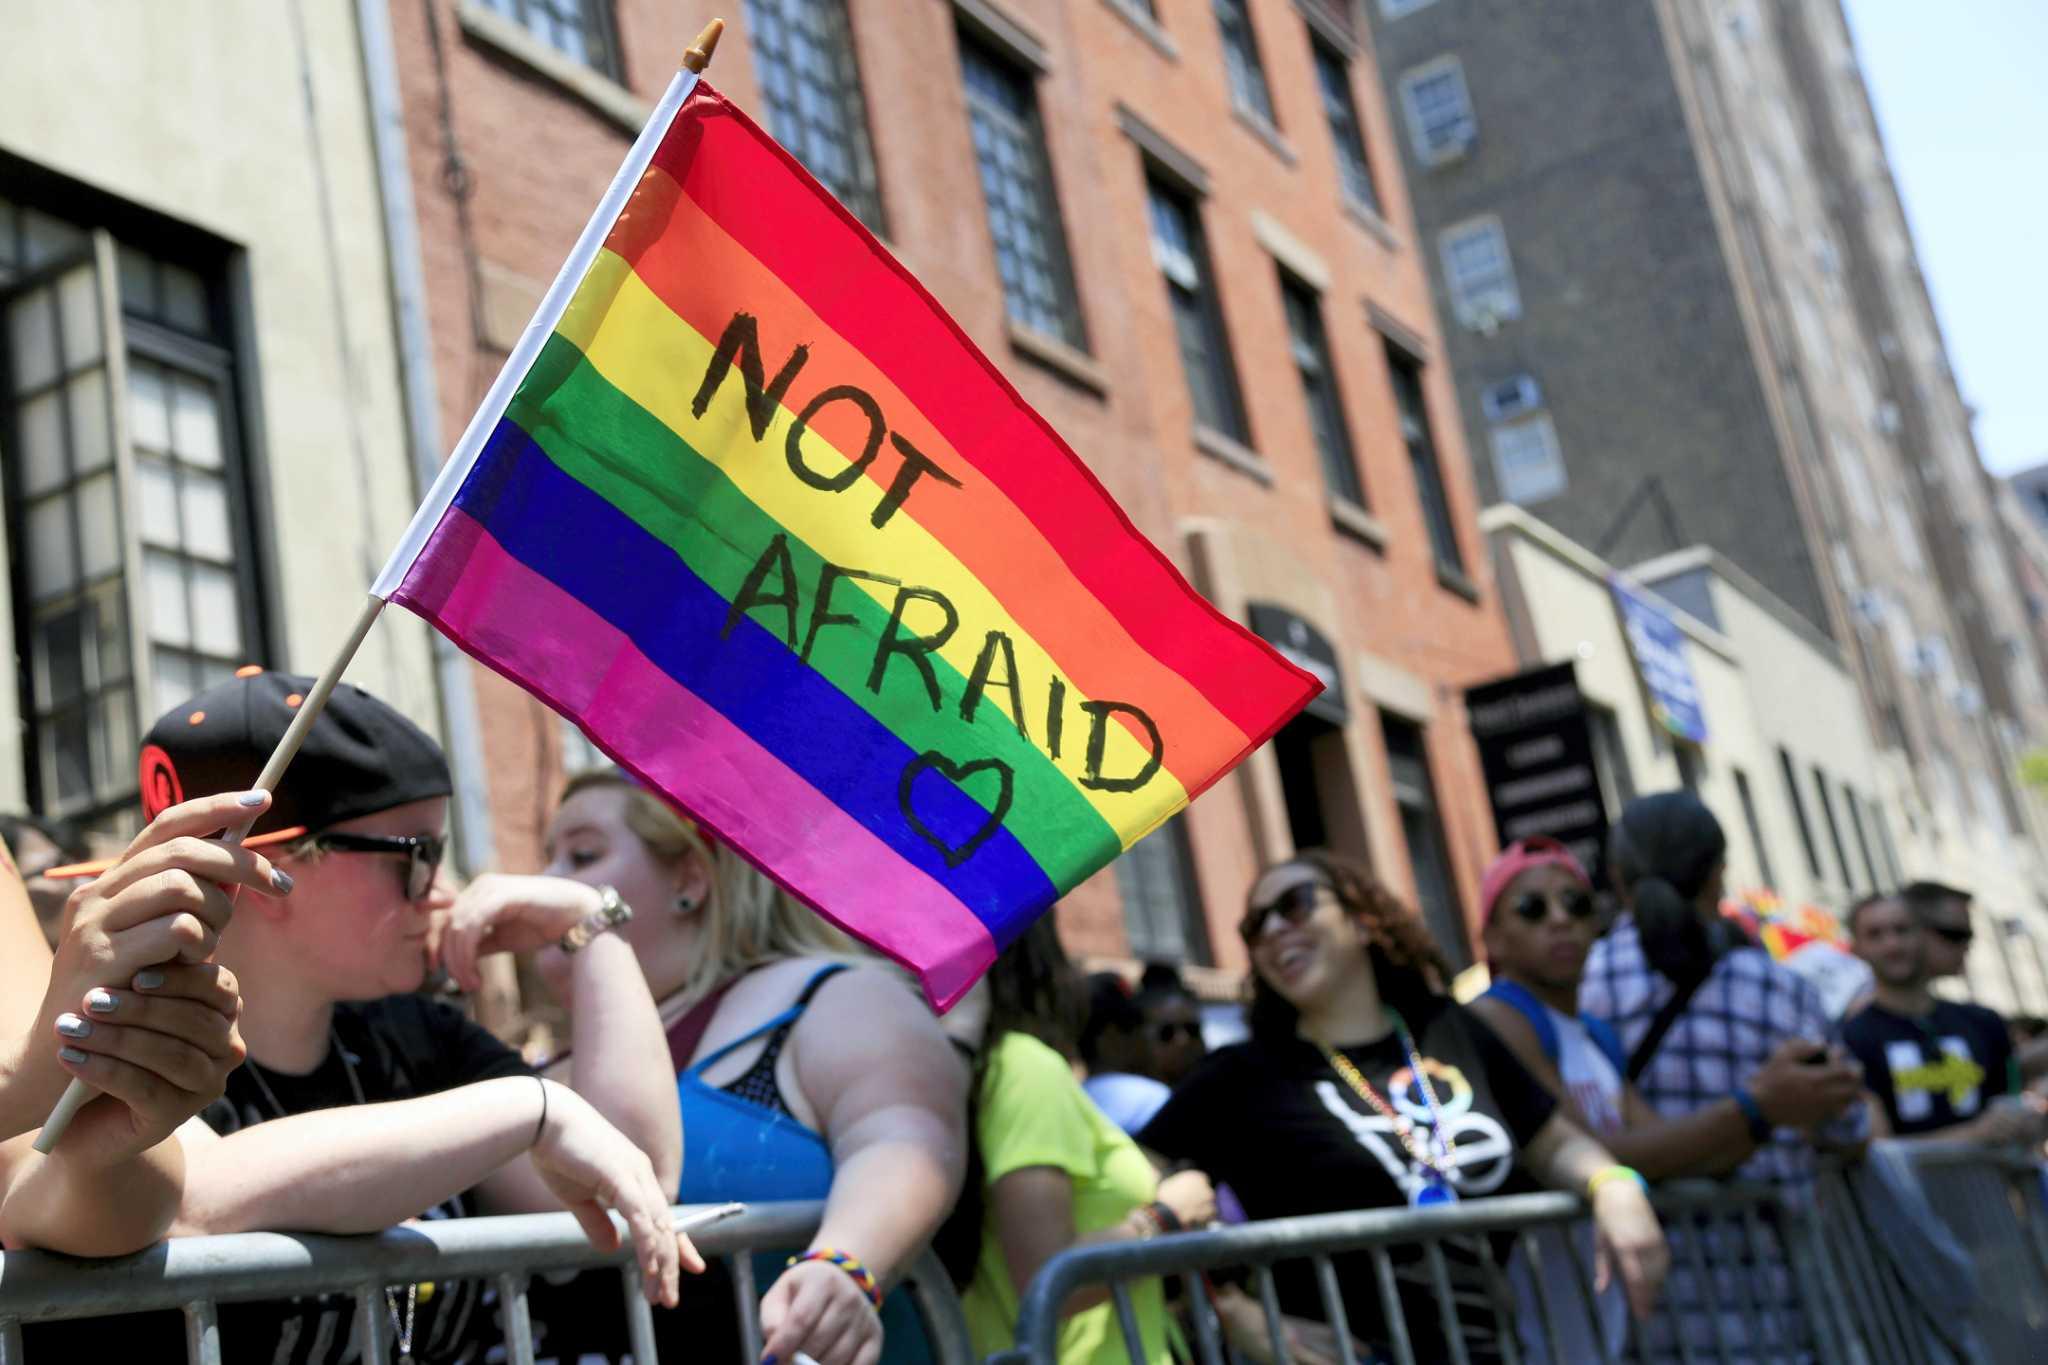 Views of homosexuality around the world